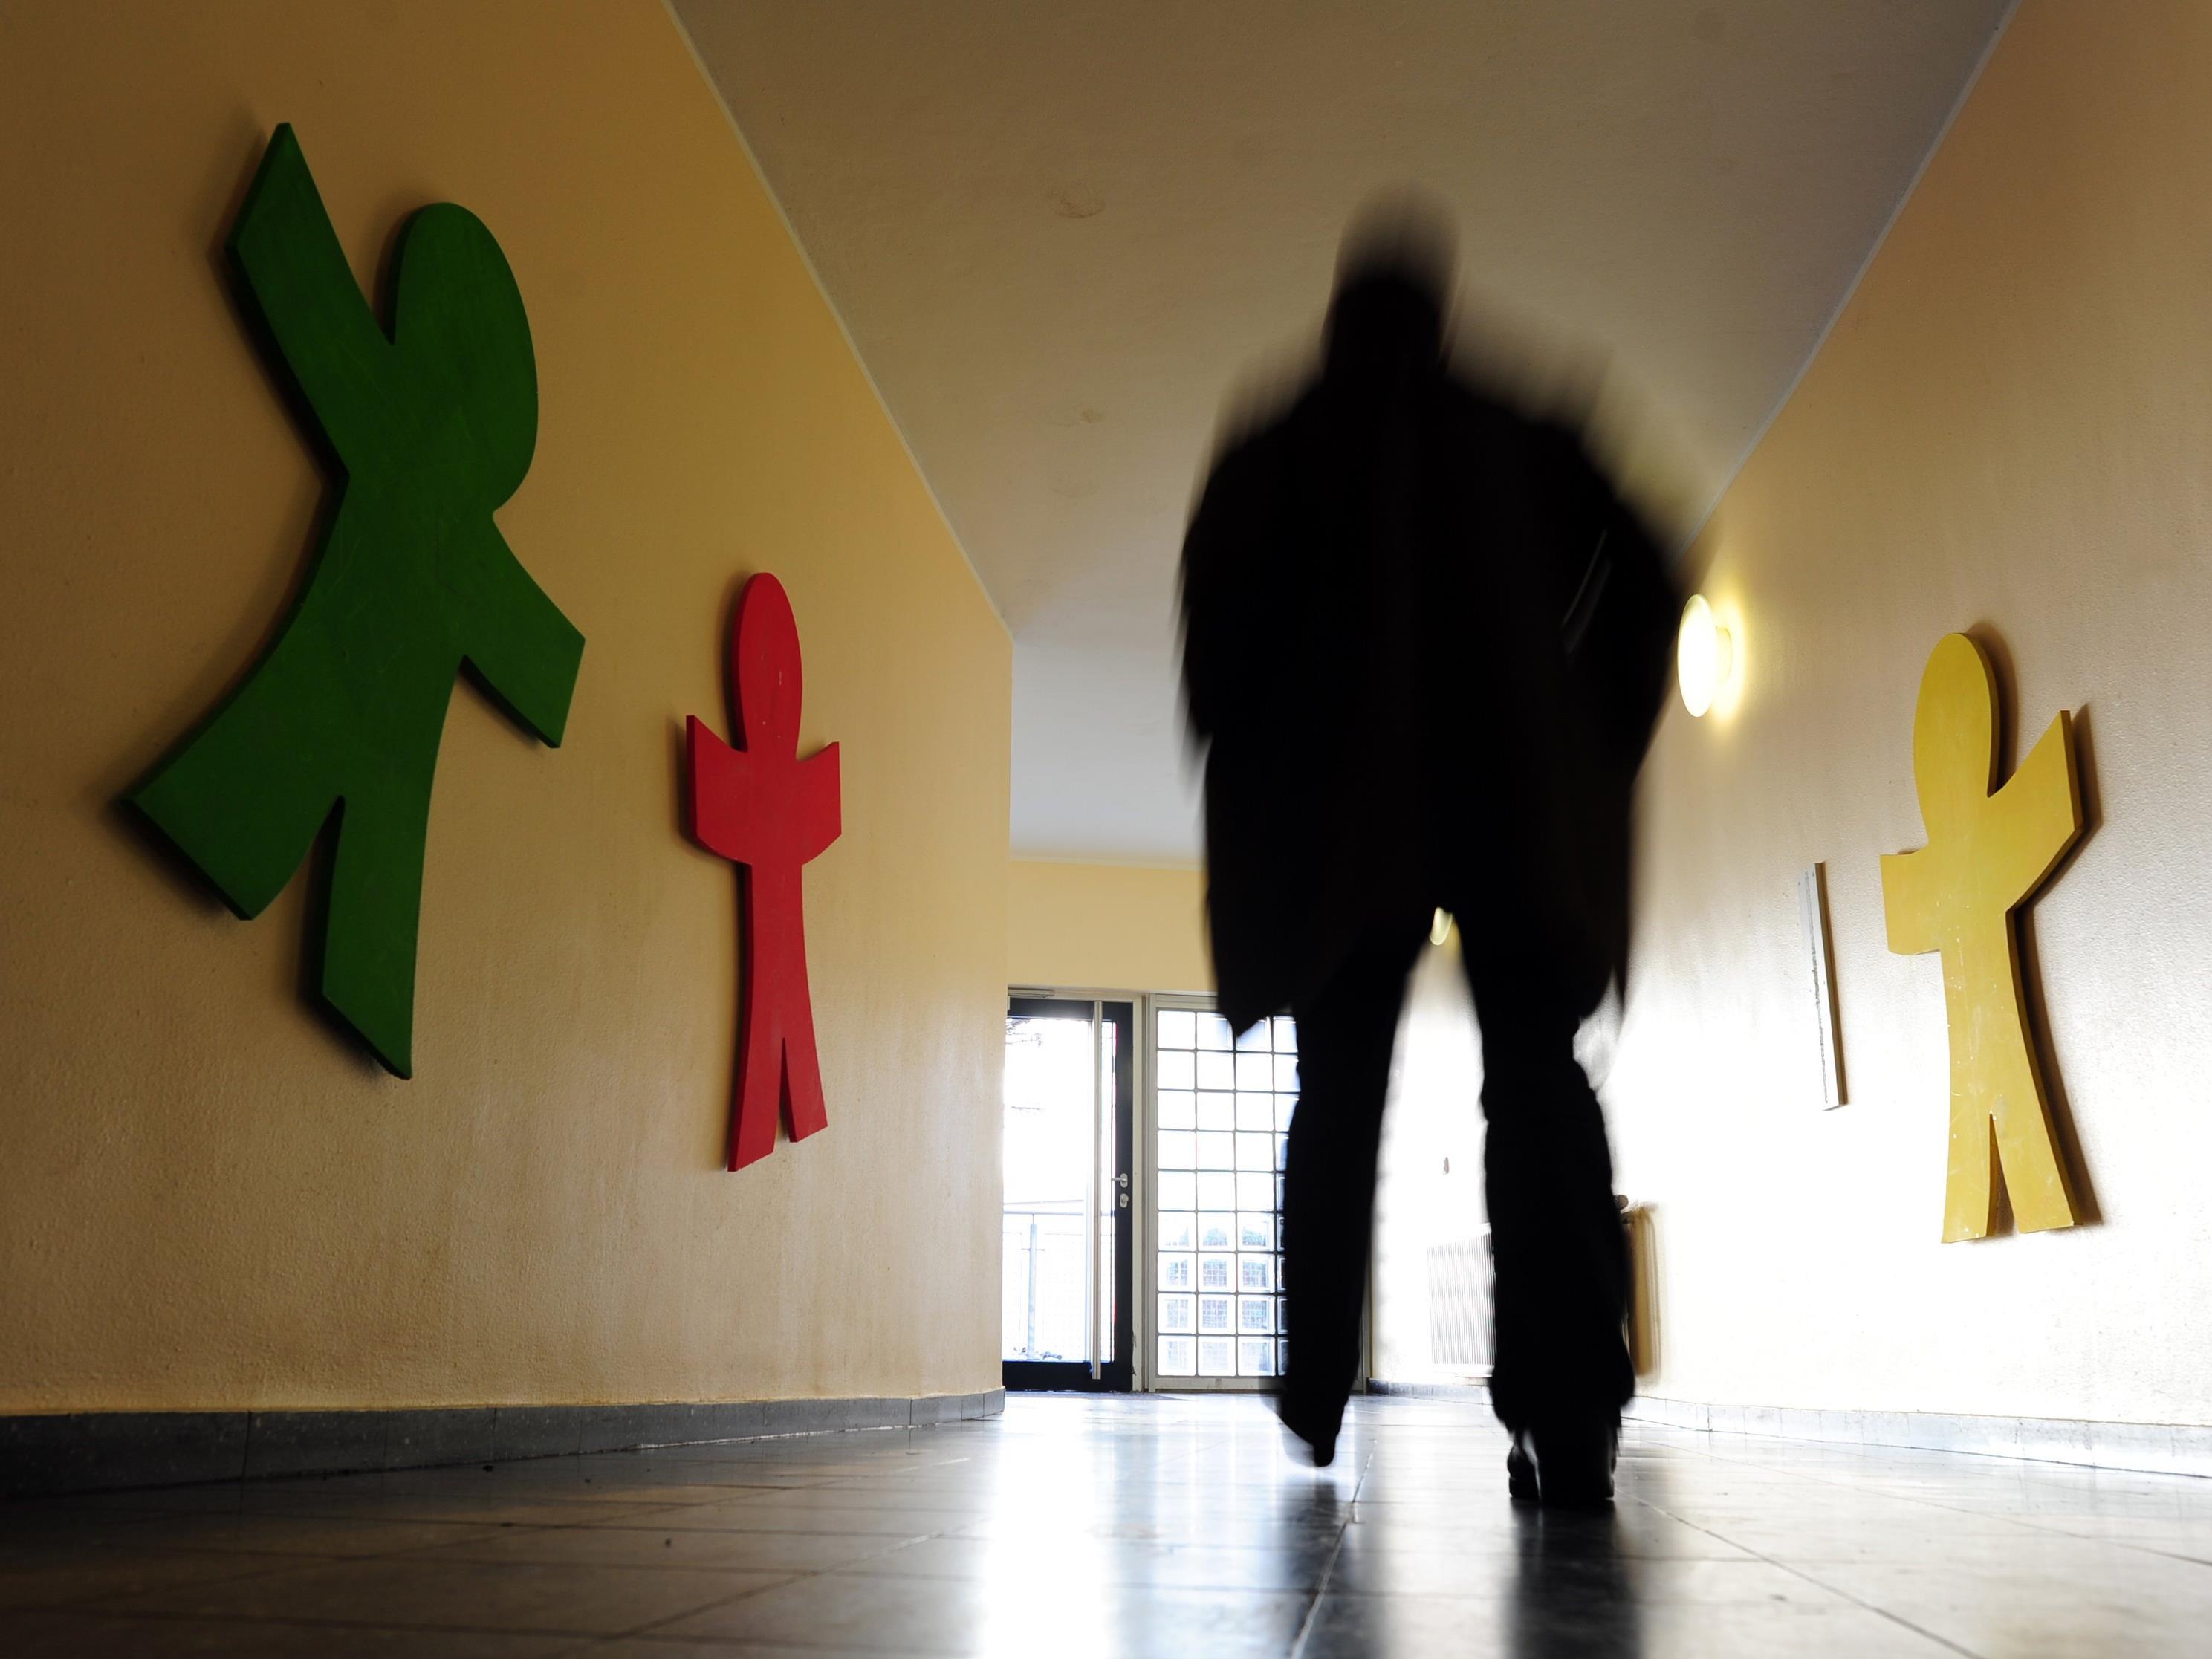 Täglich zwei Kinder zwangsweise in Wiener Erwachsenenpsychiatrie